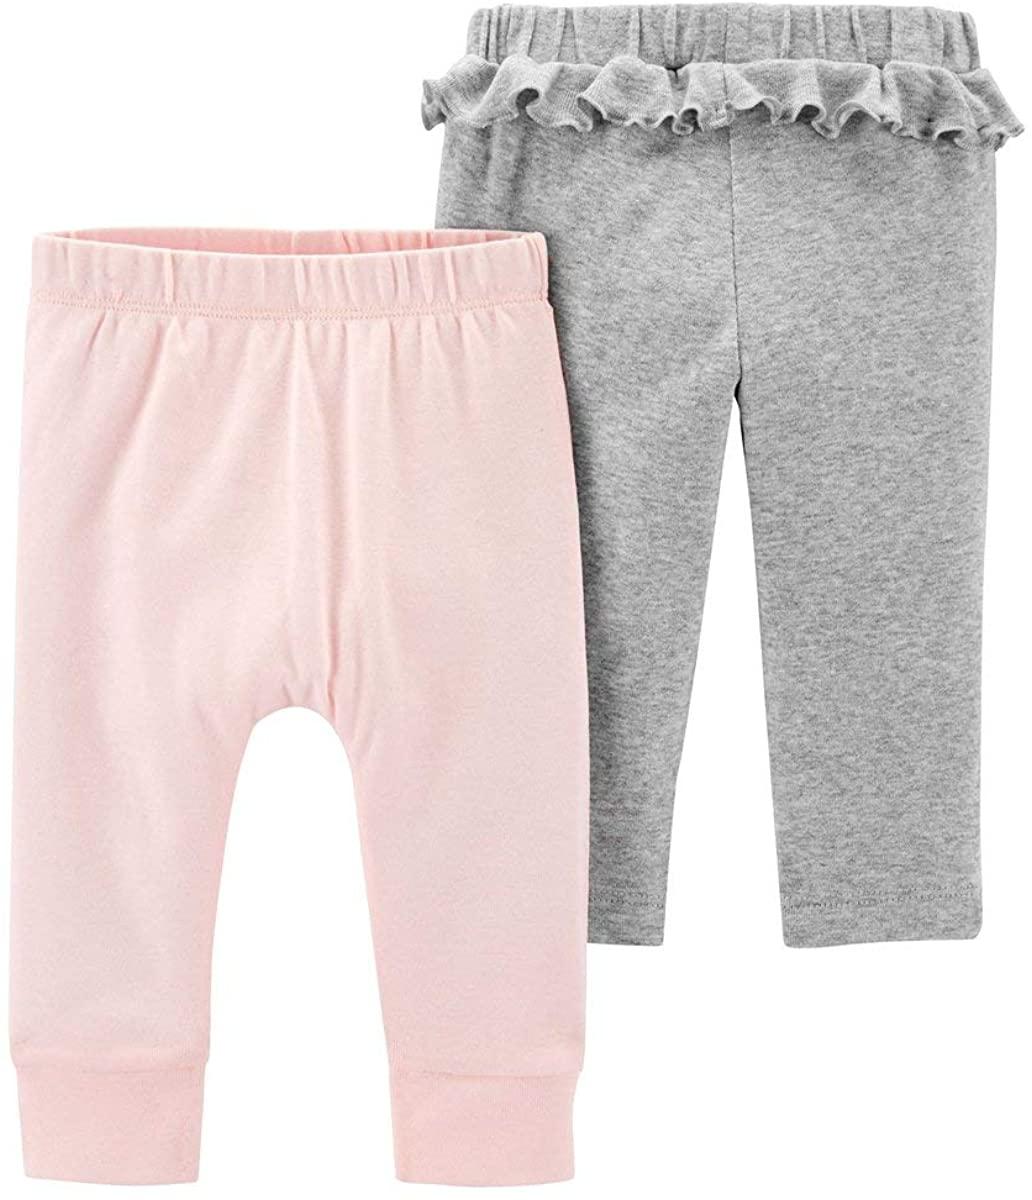 Carter's Baby Girls' 2 Pack Babysoft Pants- Pink/Grey, 3 Months